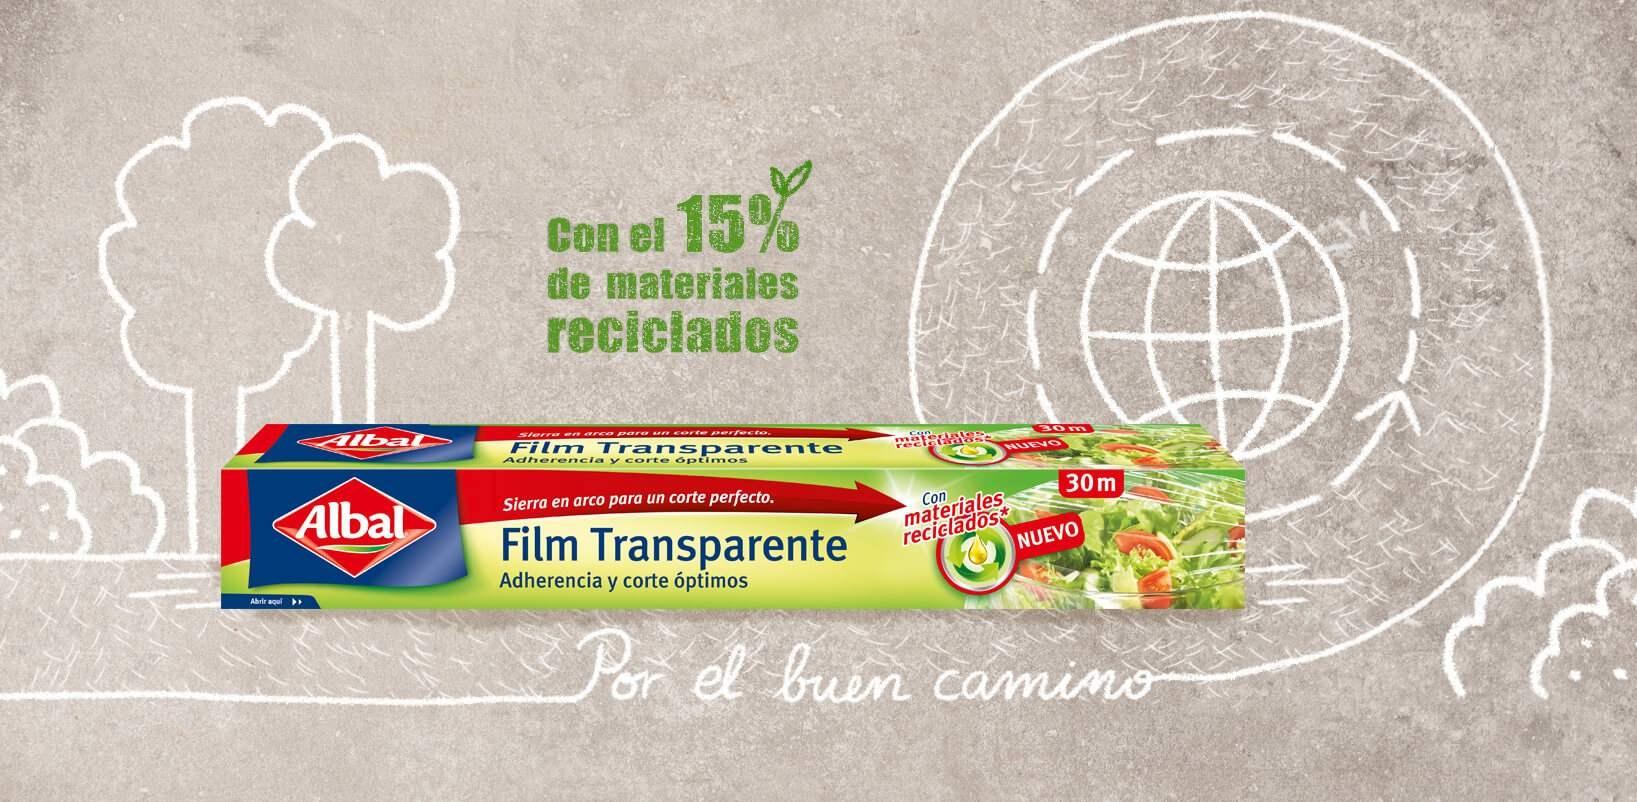 Nuevo film Transparente Albal® Sostenible